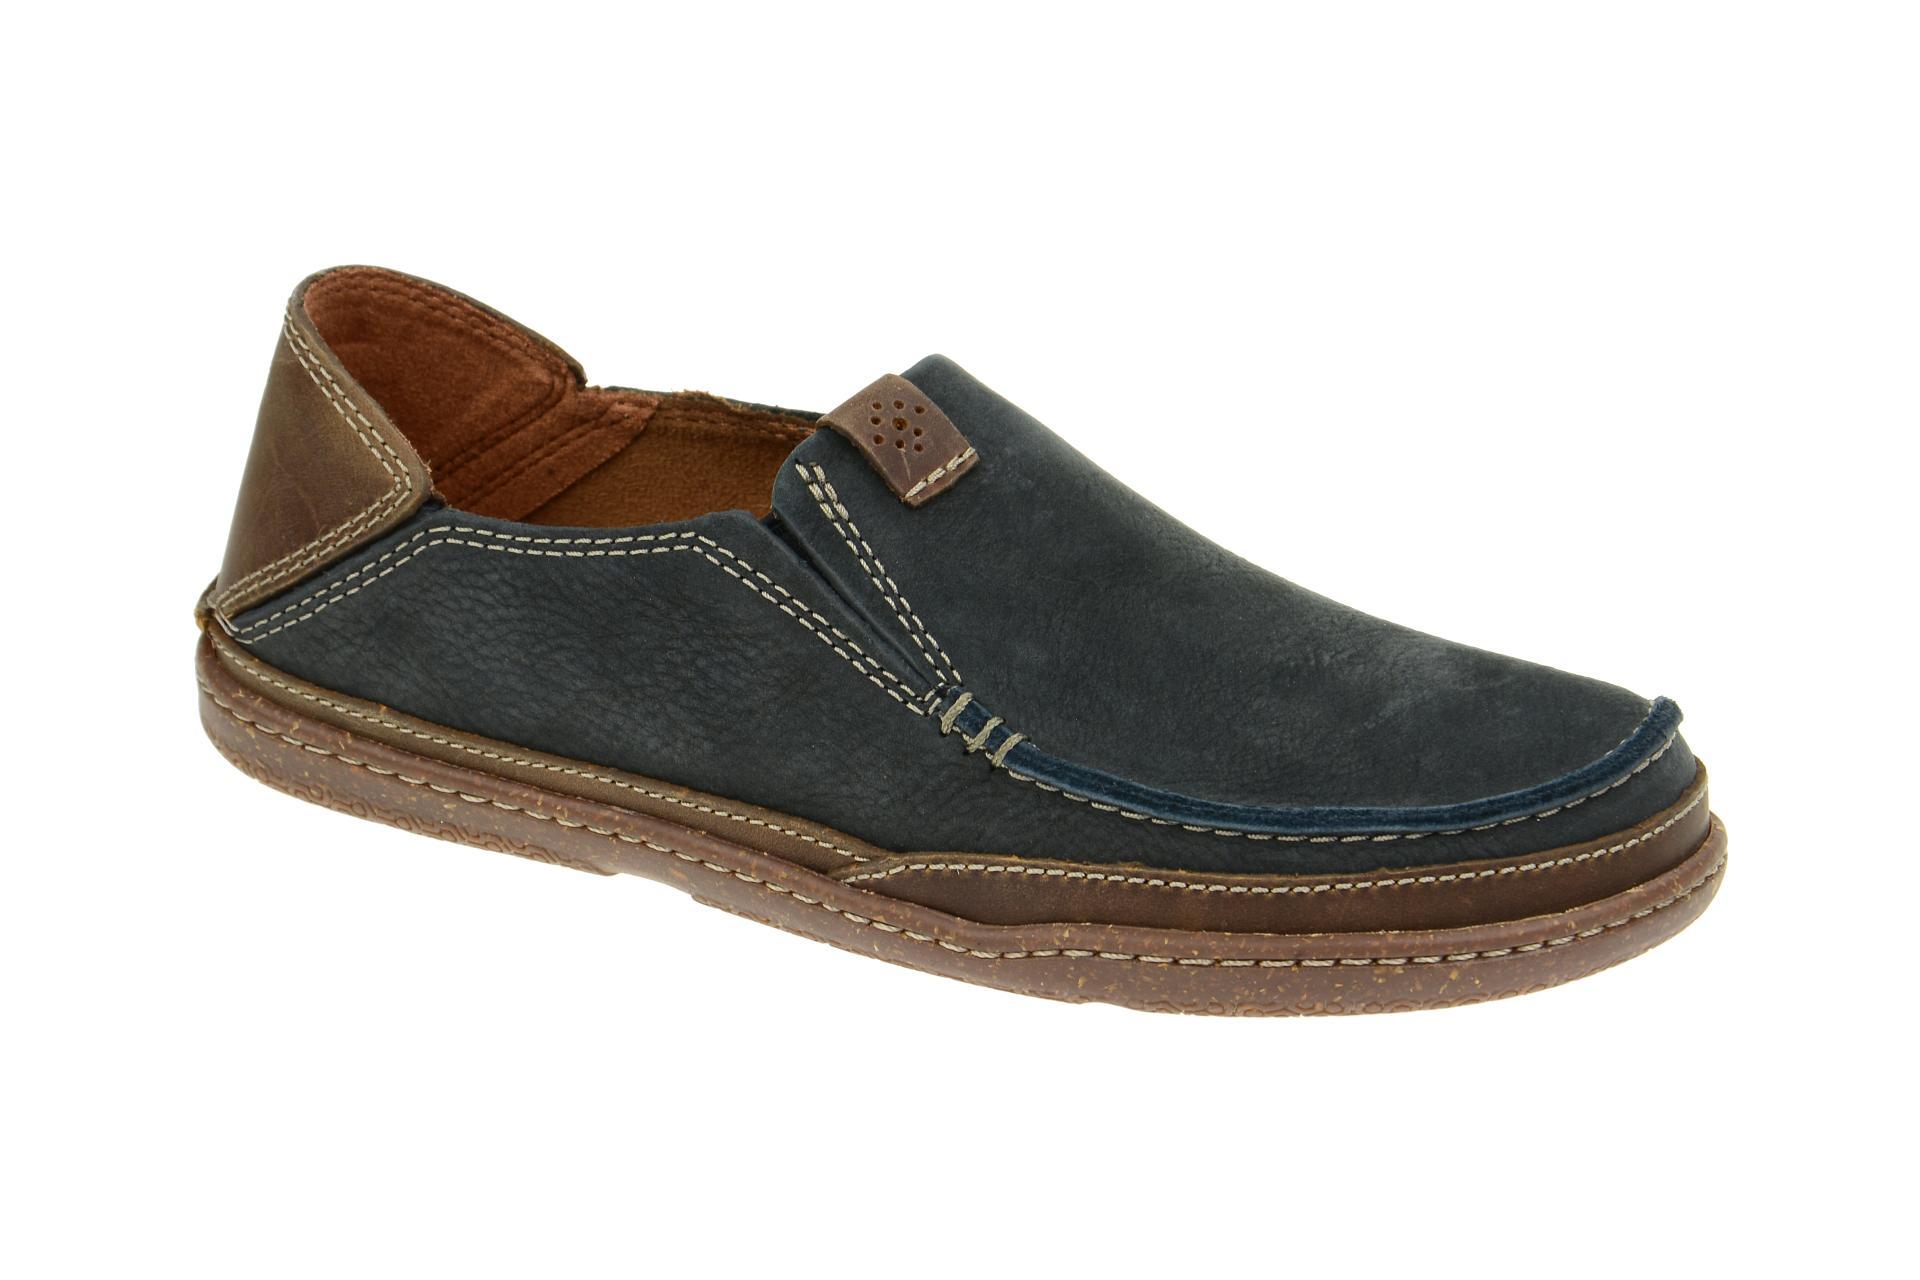 Schuhhaus Form Blau Shop Clarks Schuhe Strauch Trapell Slipper orthCBQdsx